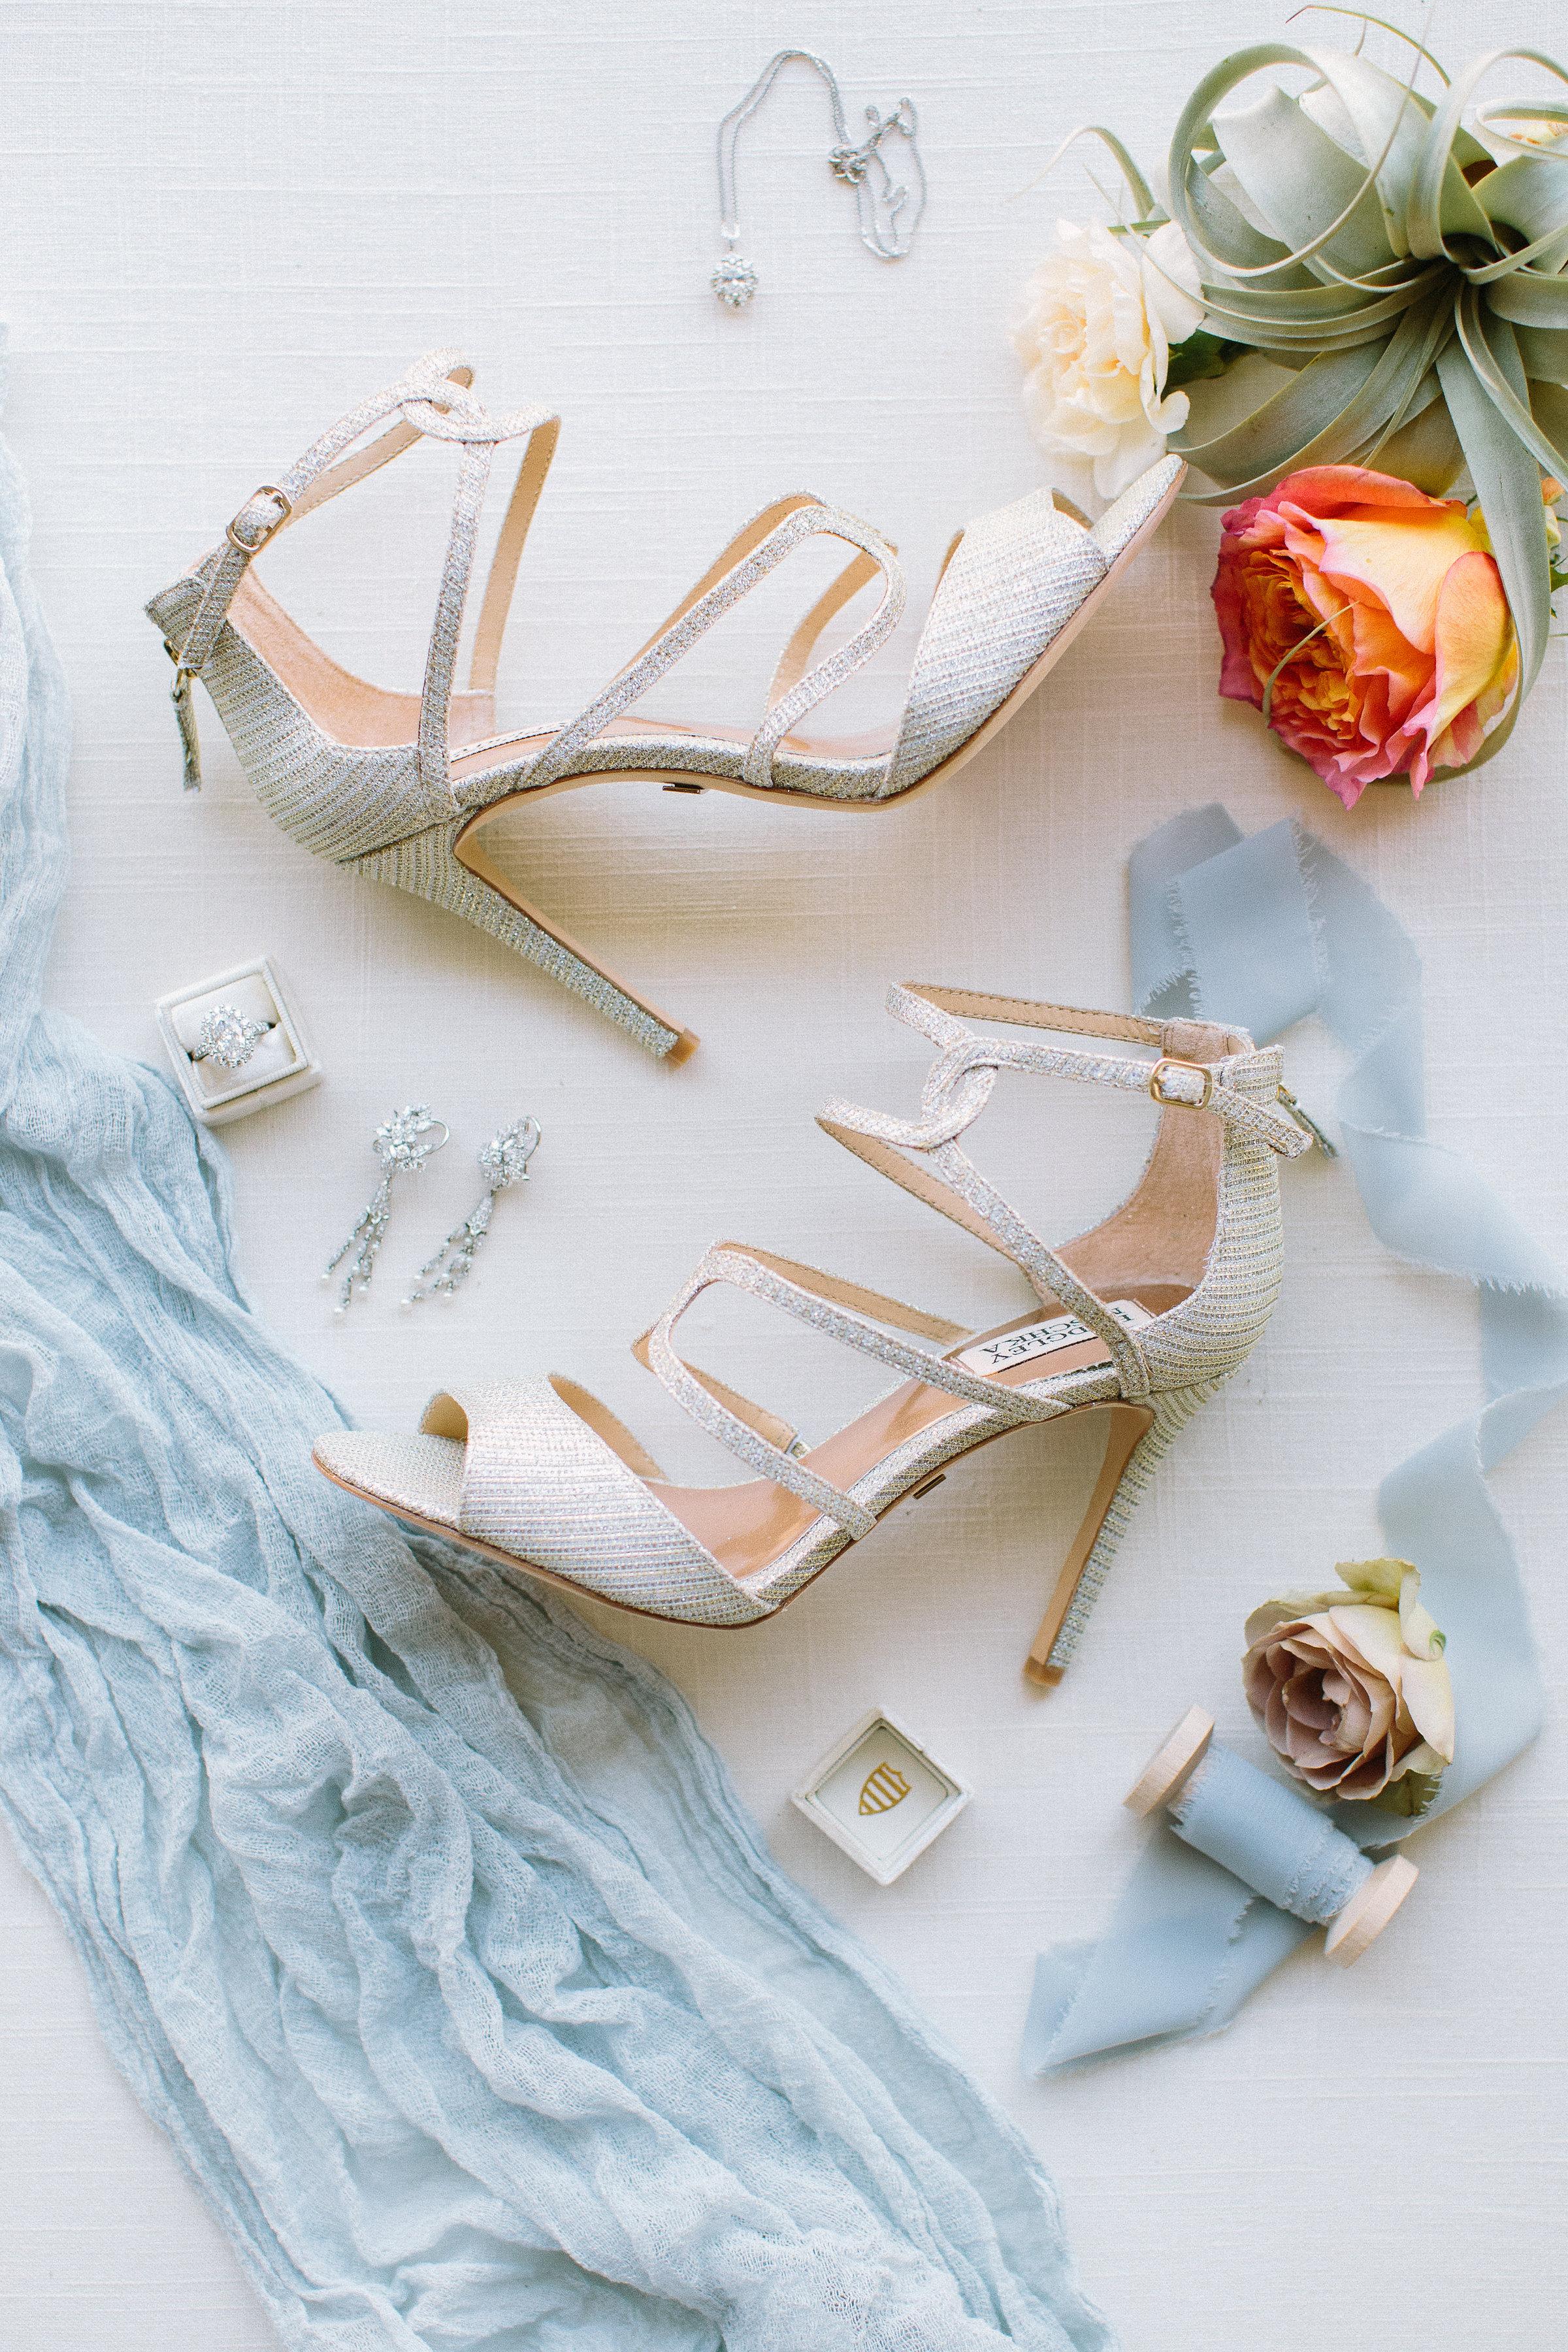 Ellen-Ashton-Photography-Peach-Creek-Ranch-Weddings-Wed-and-Prosper30.jpg